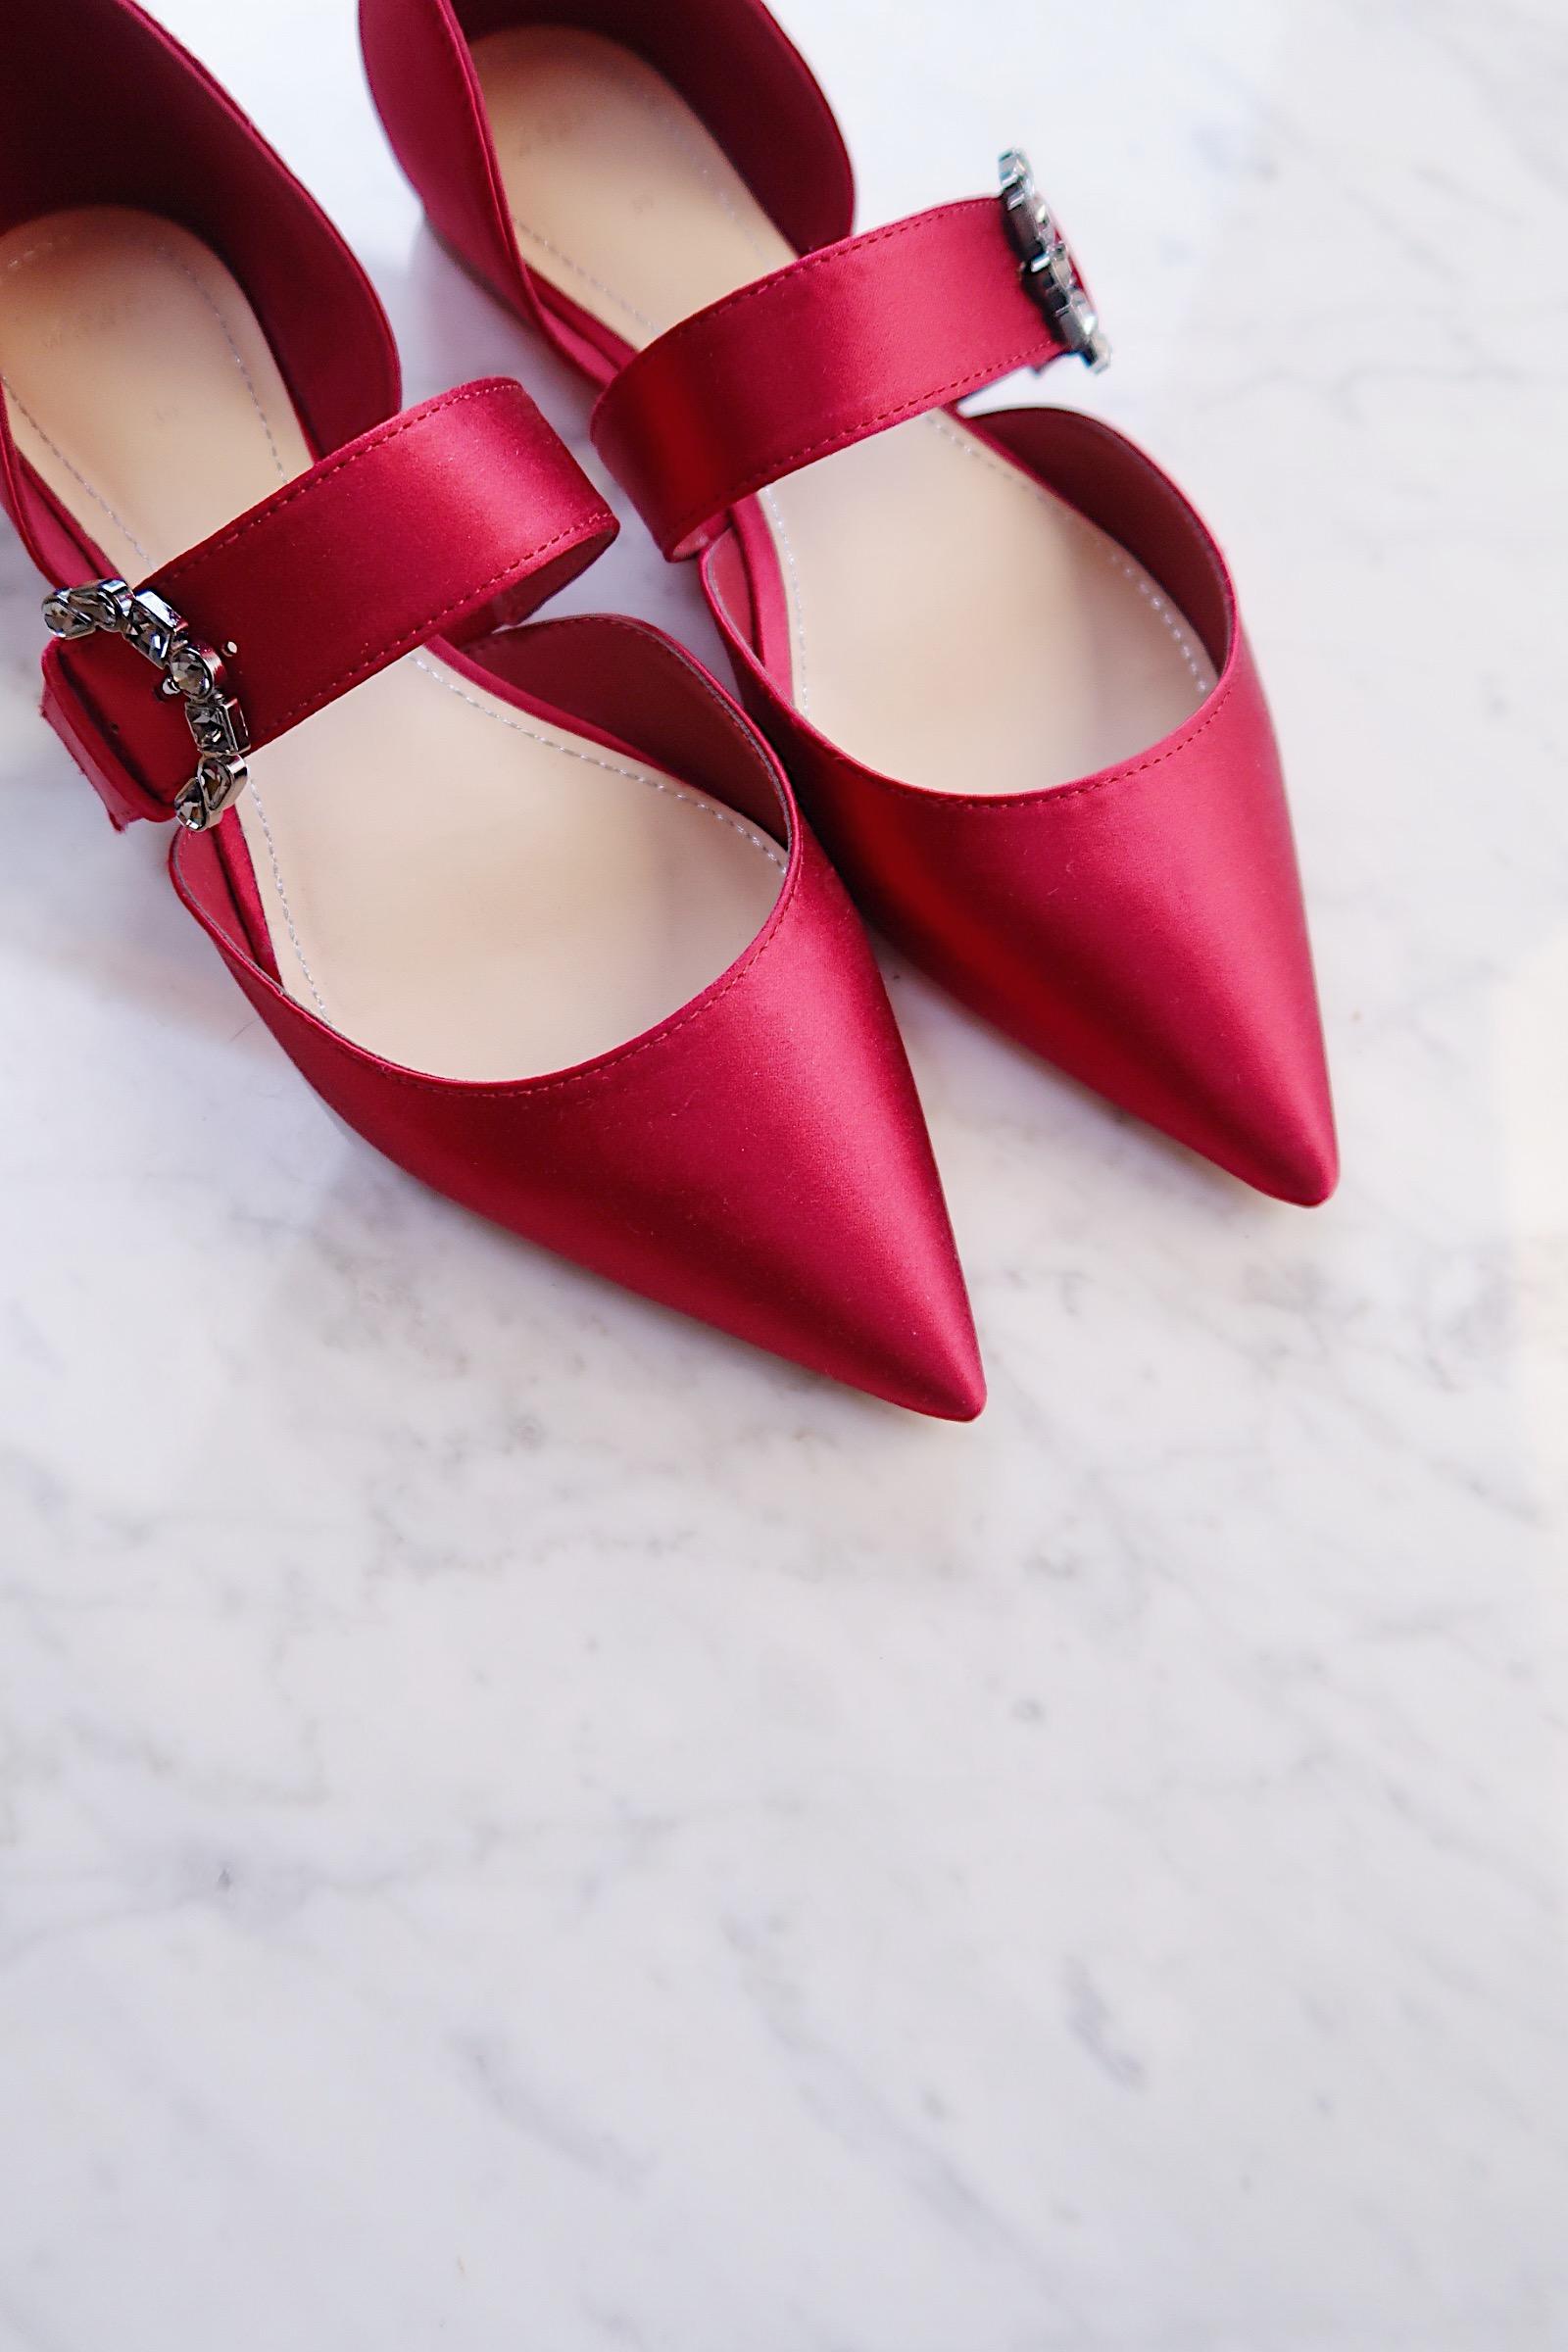 Zara burgundy ballerina flats with gem buckle | Favorite Fall Flats | Sundays and Somedays